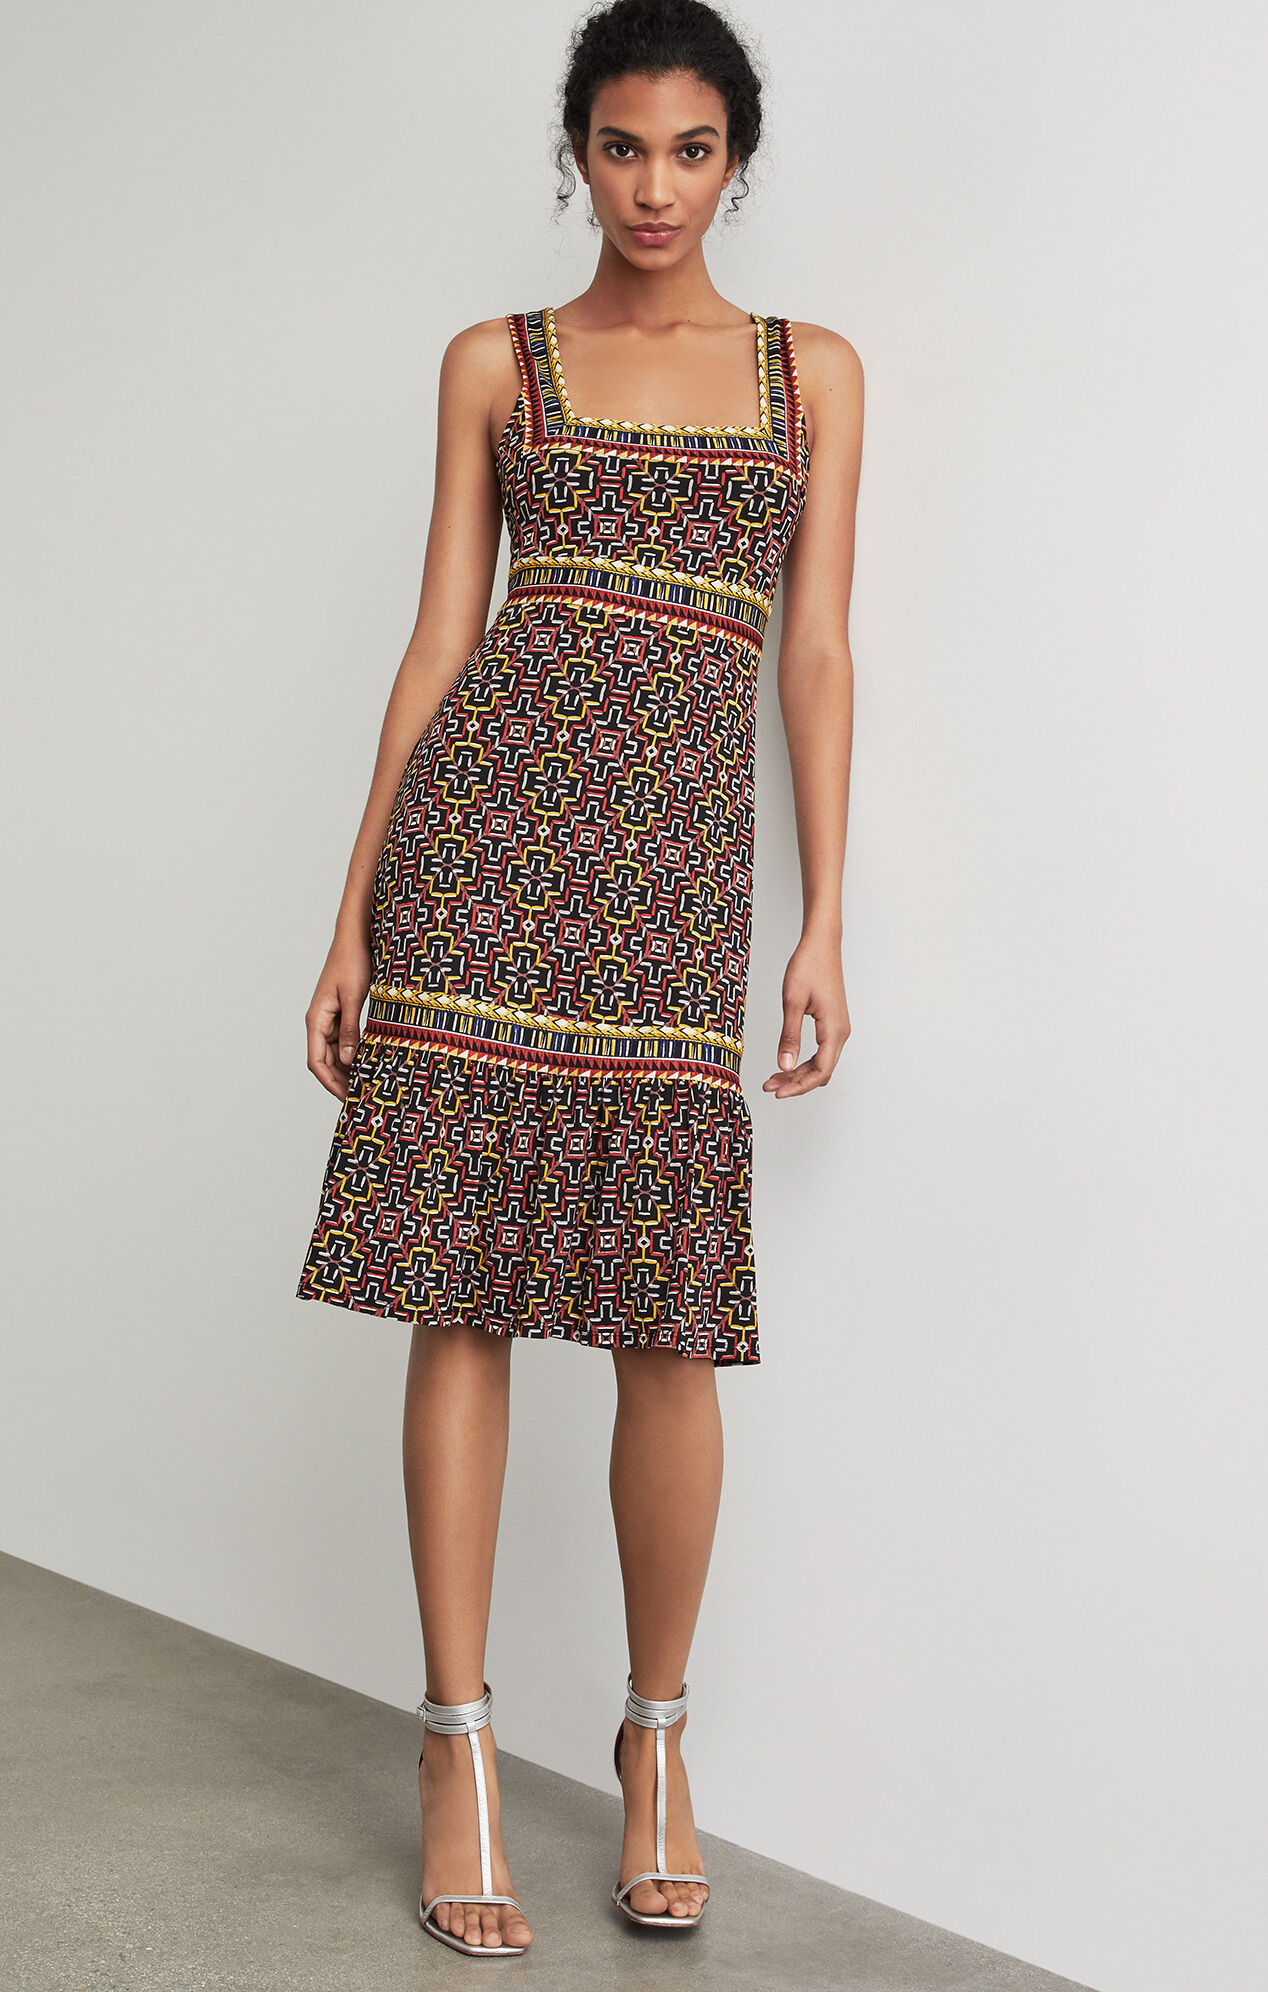 BCBGMAXAZRIA: Printed Square Neck Dress